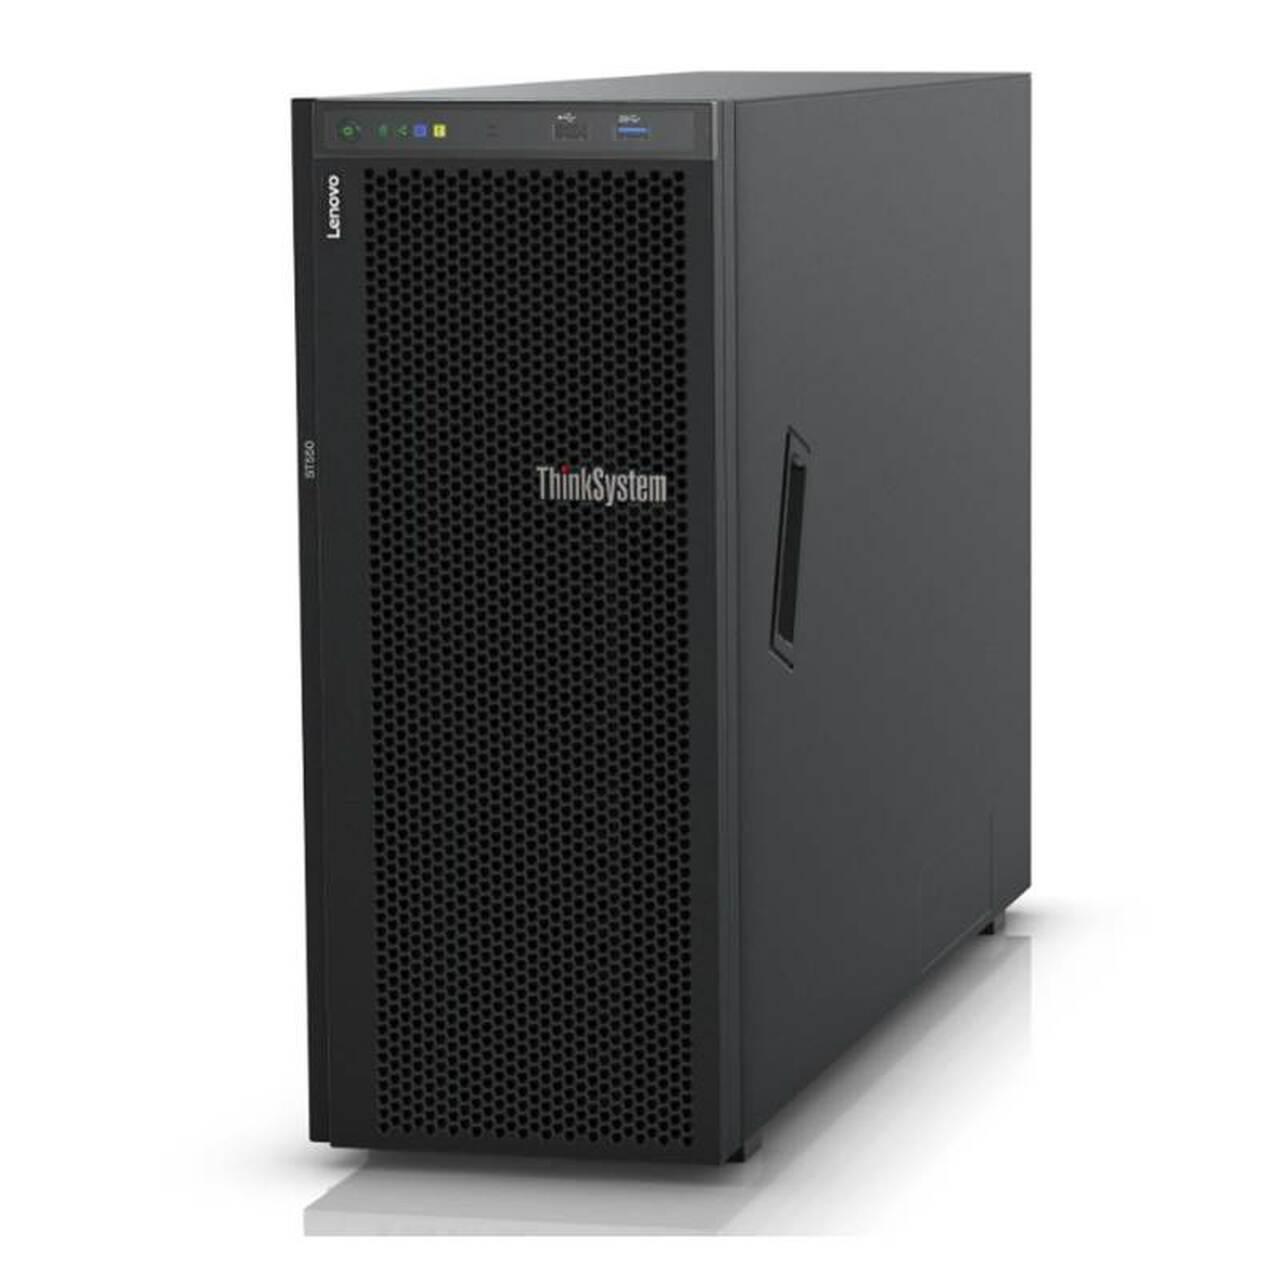 LENOVO, ThinkSystem, ST550, 4U, Tower, Server, 1, x, Intel, Xeon, Bronze, 3204, 1x16GB, 2Rx8, 4, x, 3.5, HS, Bay, HW, RAID, 530-8i, PCIe,